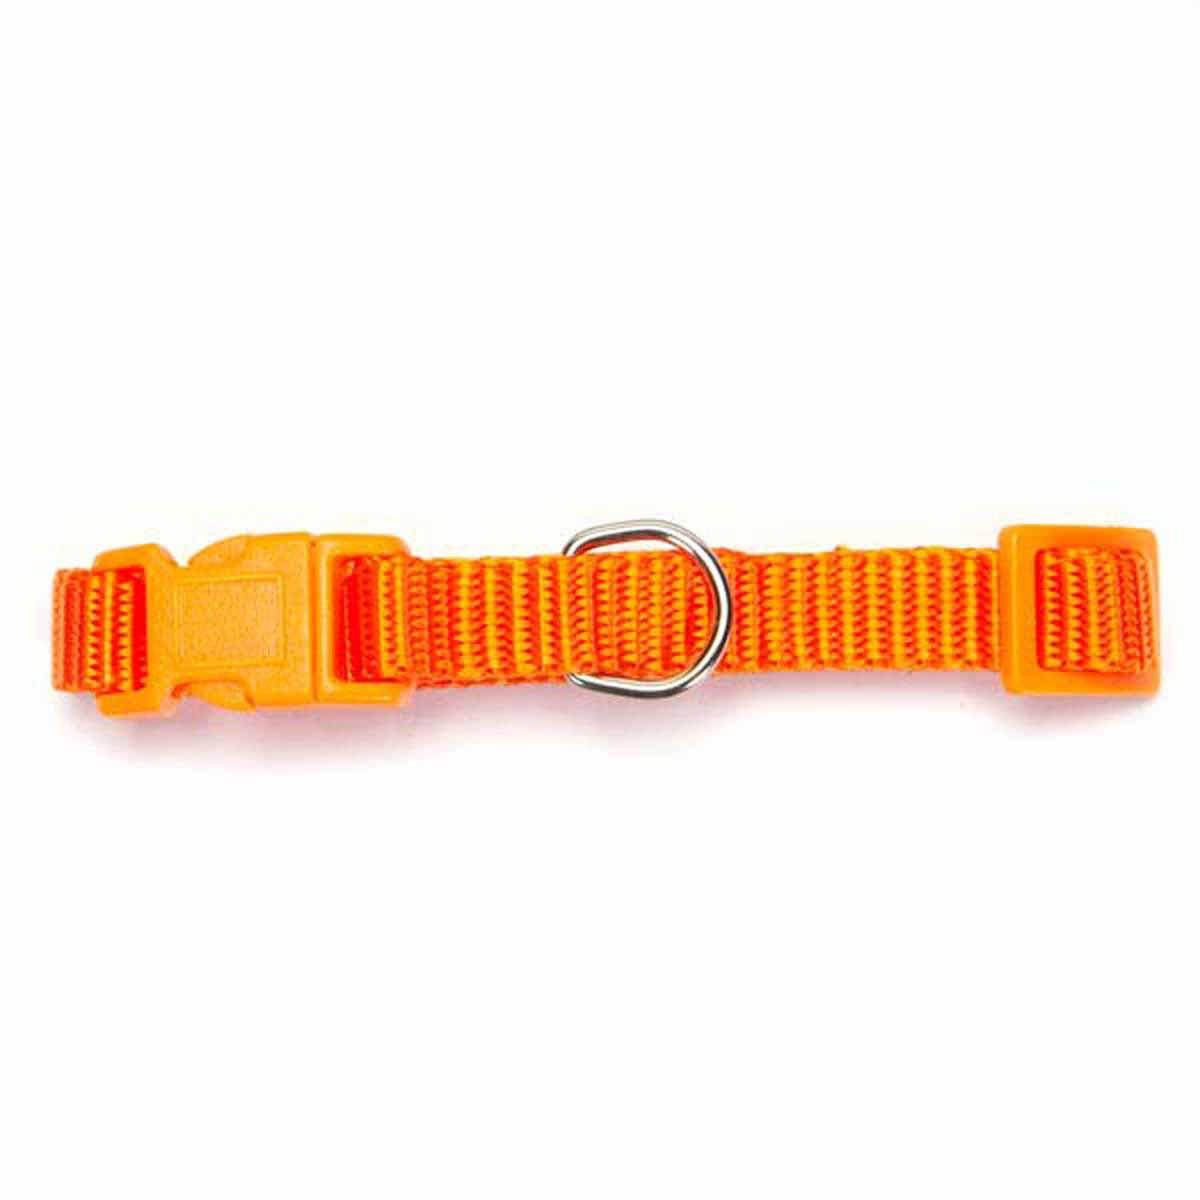 Nylon Dog Collar by Zack and Zoey - Orange